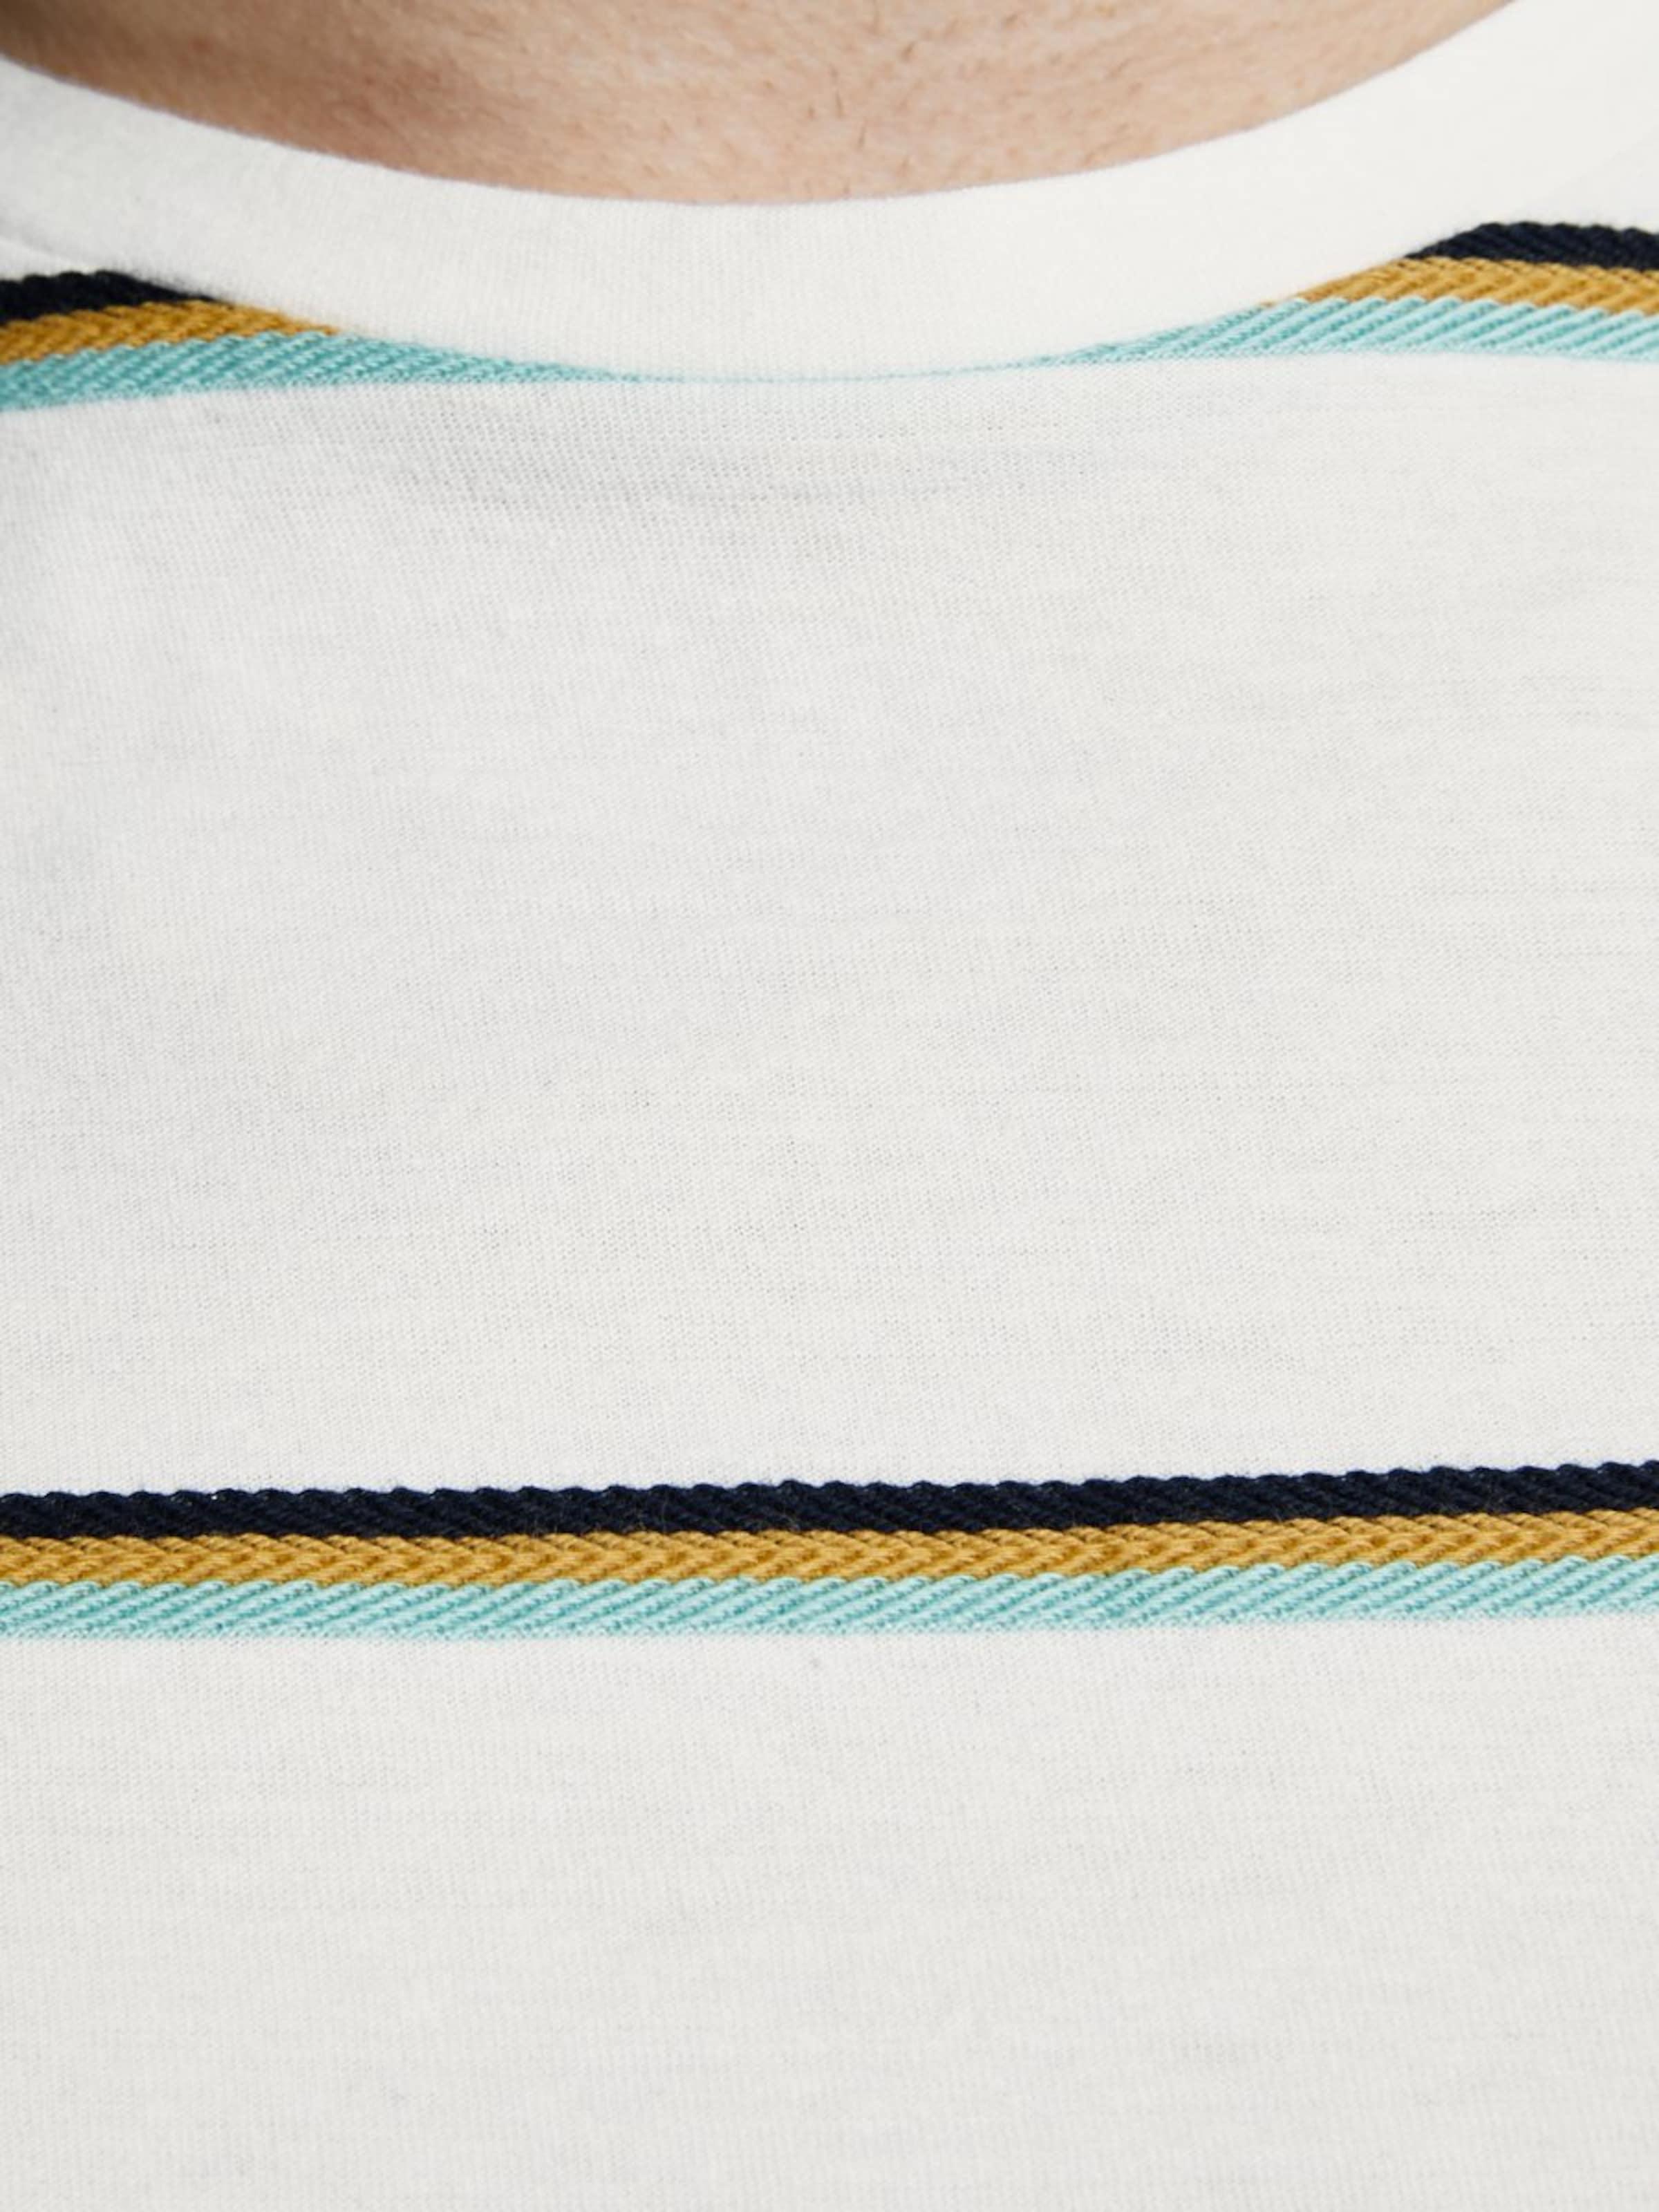 Gestreiftes shirt Jackamp; Weiß Jones T In 7IYfbv6gy